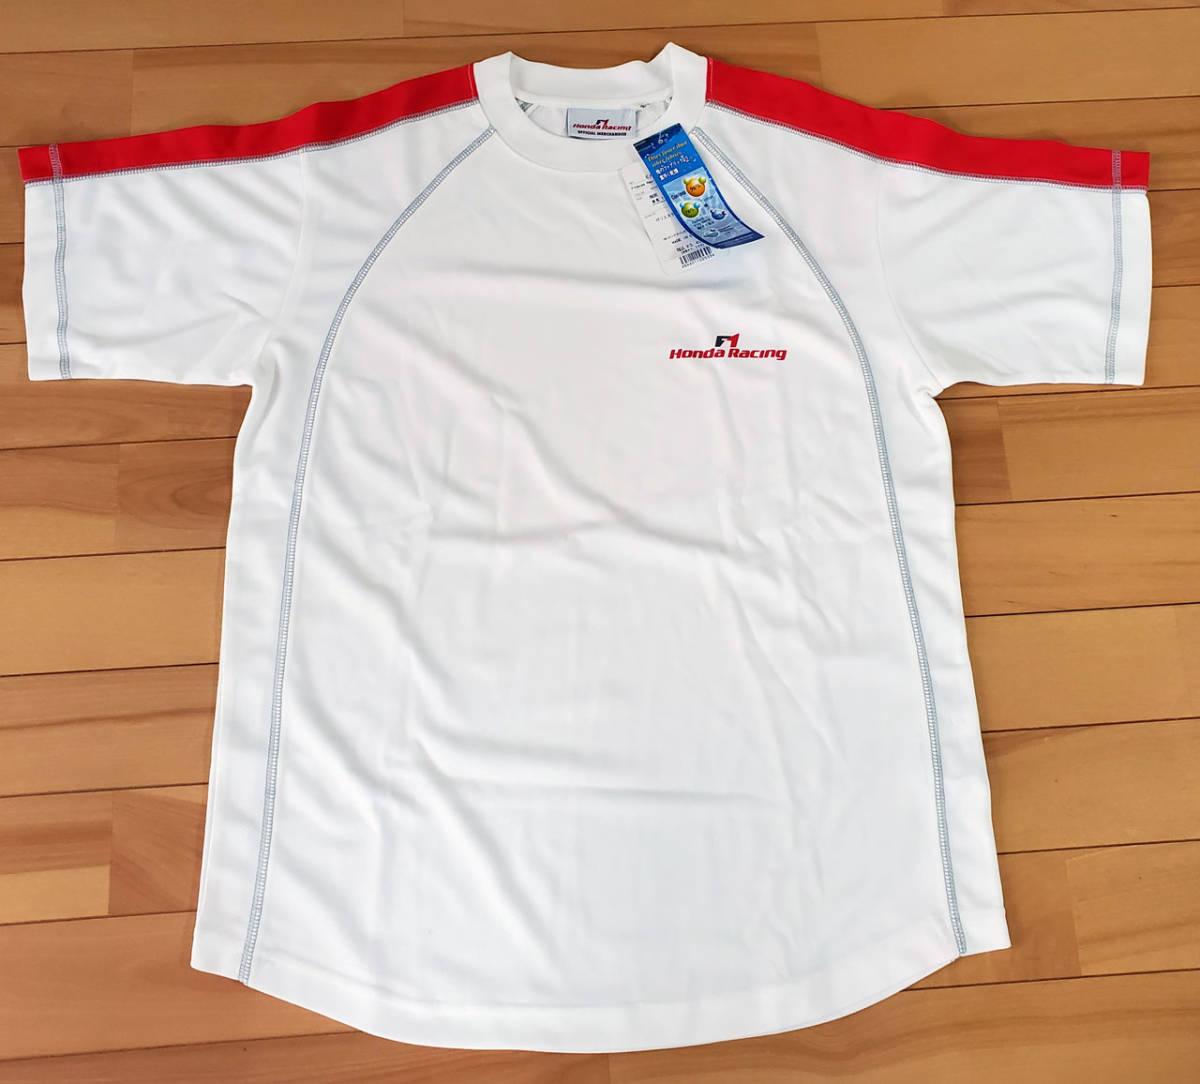 HondaRacing F1 Tシャツ Sサイズ White 未使用_画像1